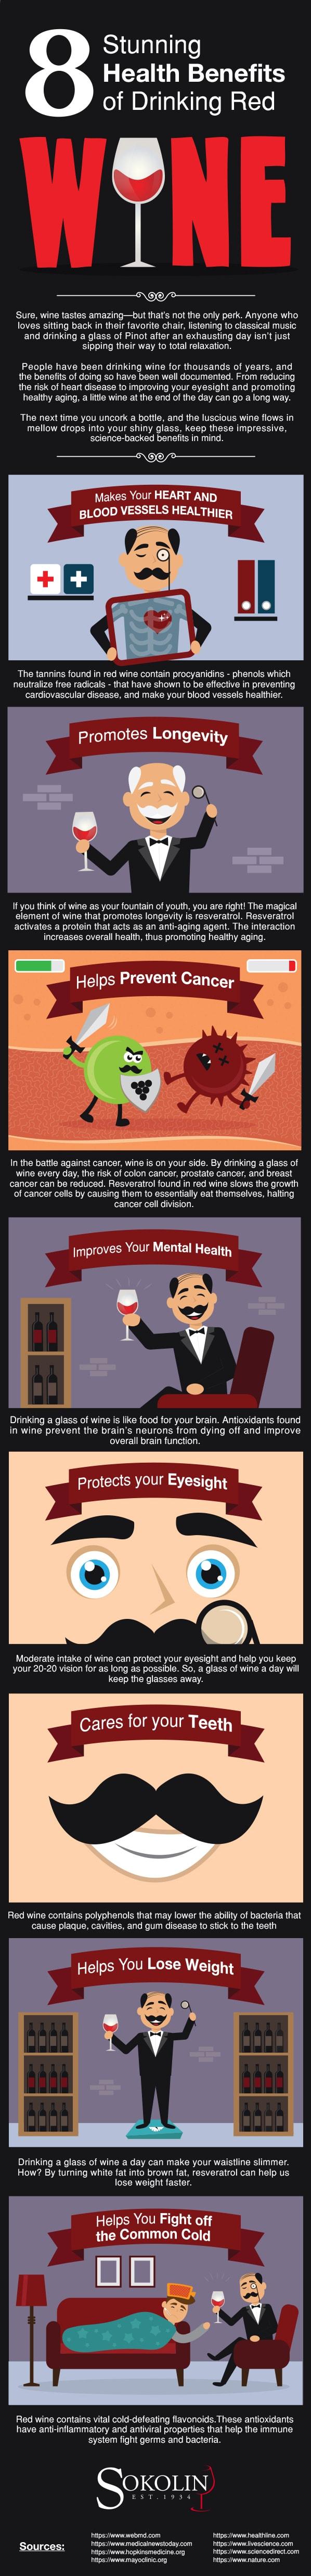 benefits of drinking wine info-graphic